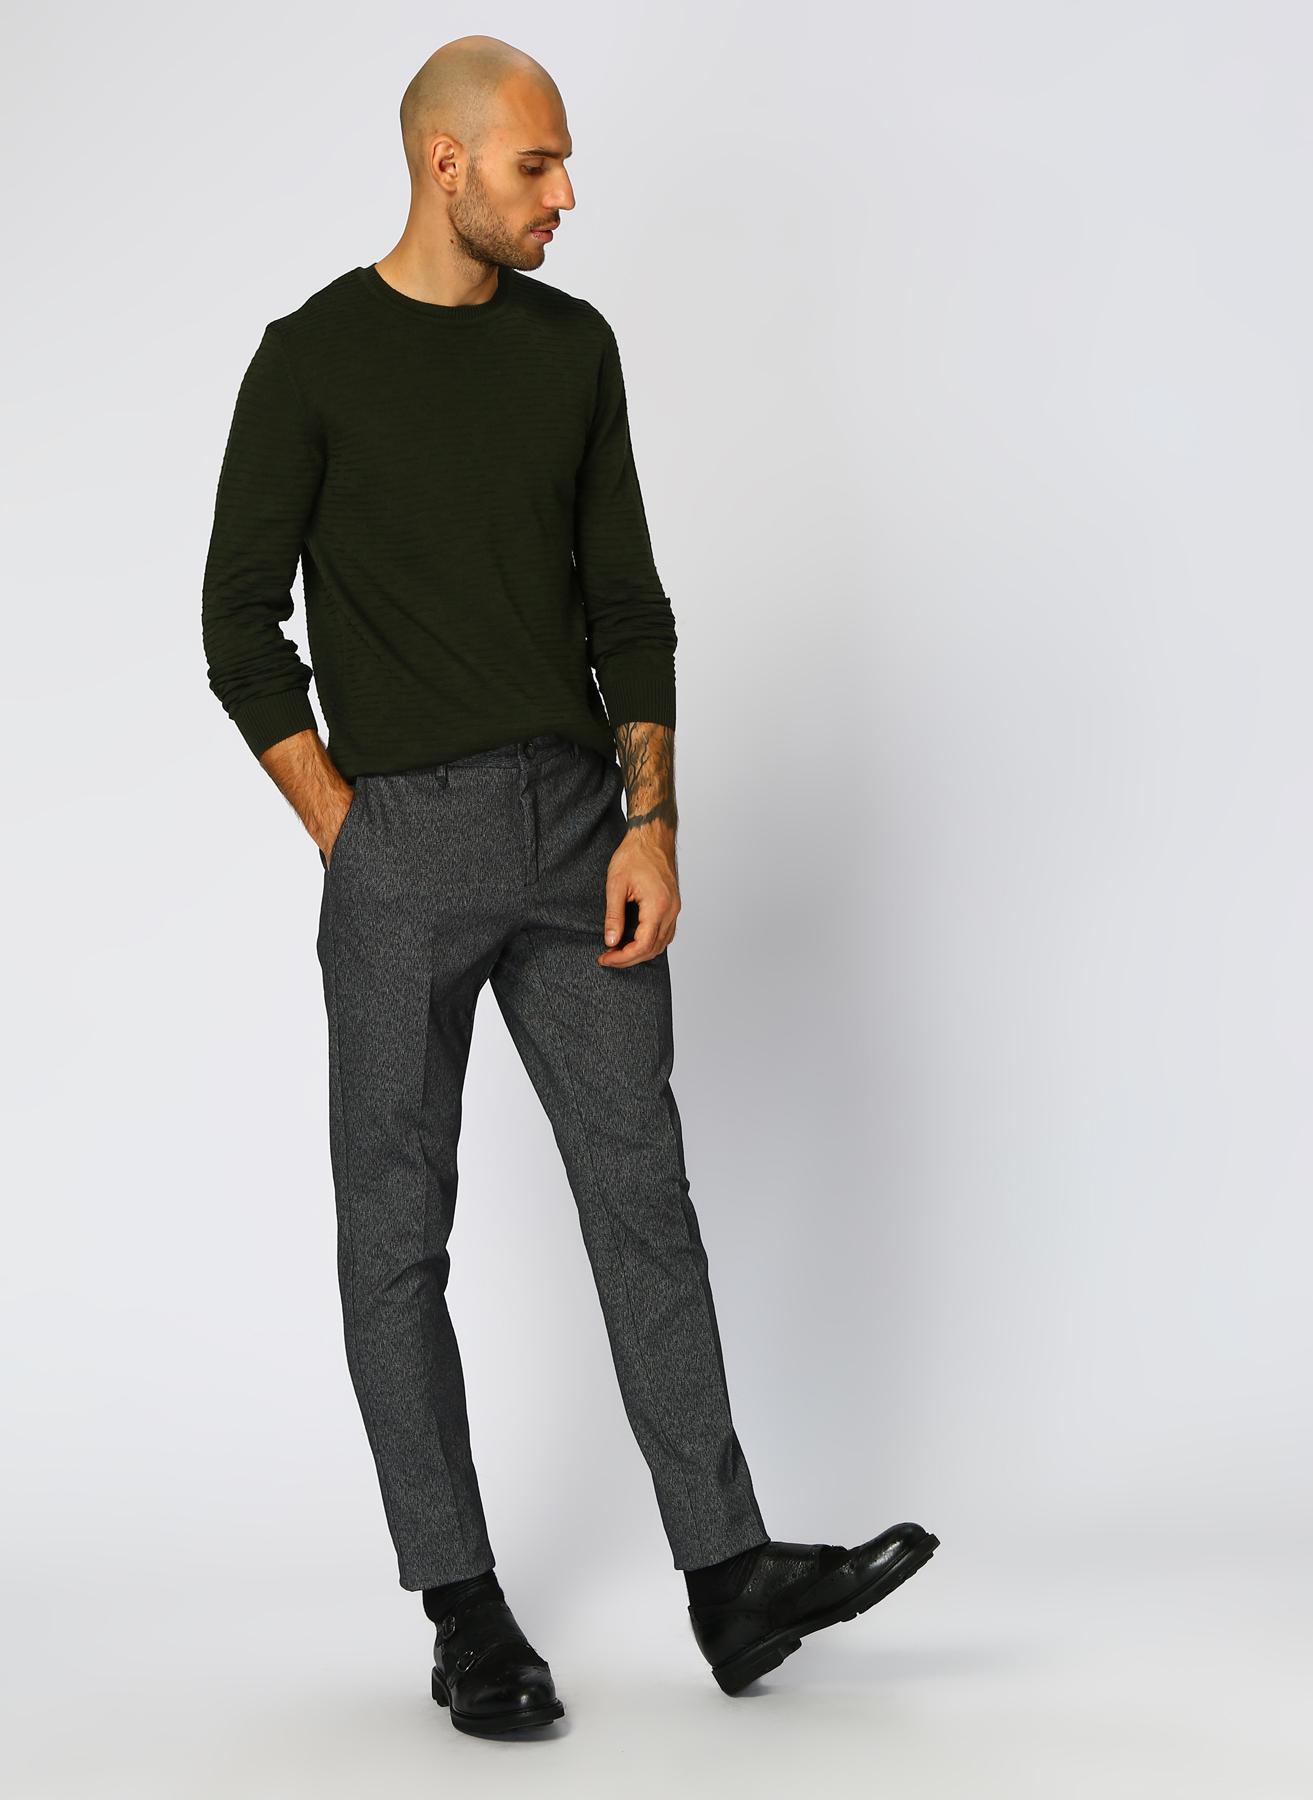 George Hogg Smart Casual Siyah Klasik Pantolon 60-6 5001699483008 Ürün Resmi